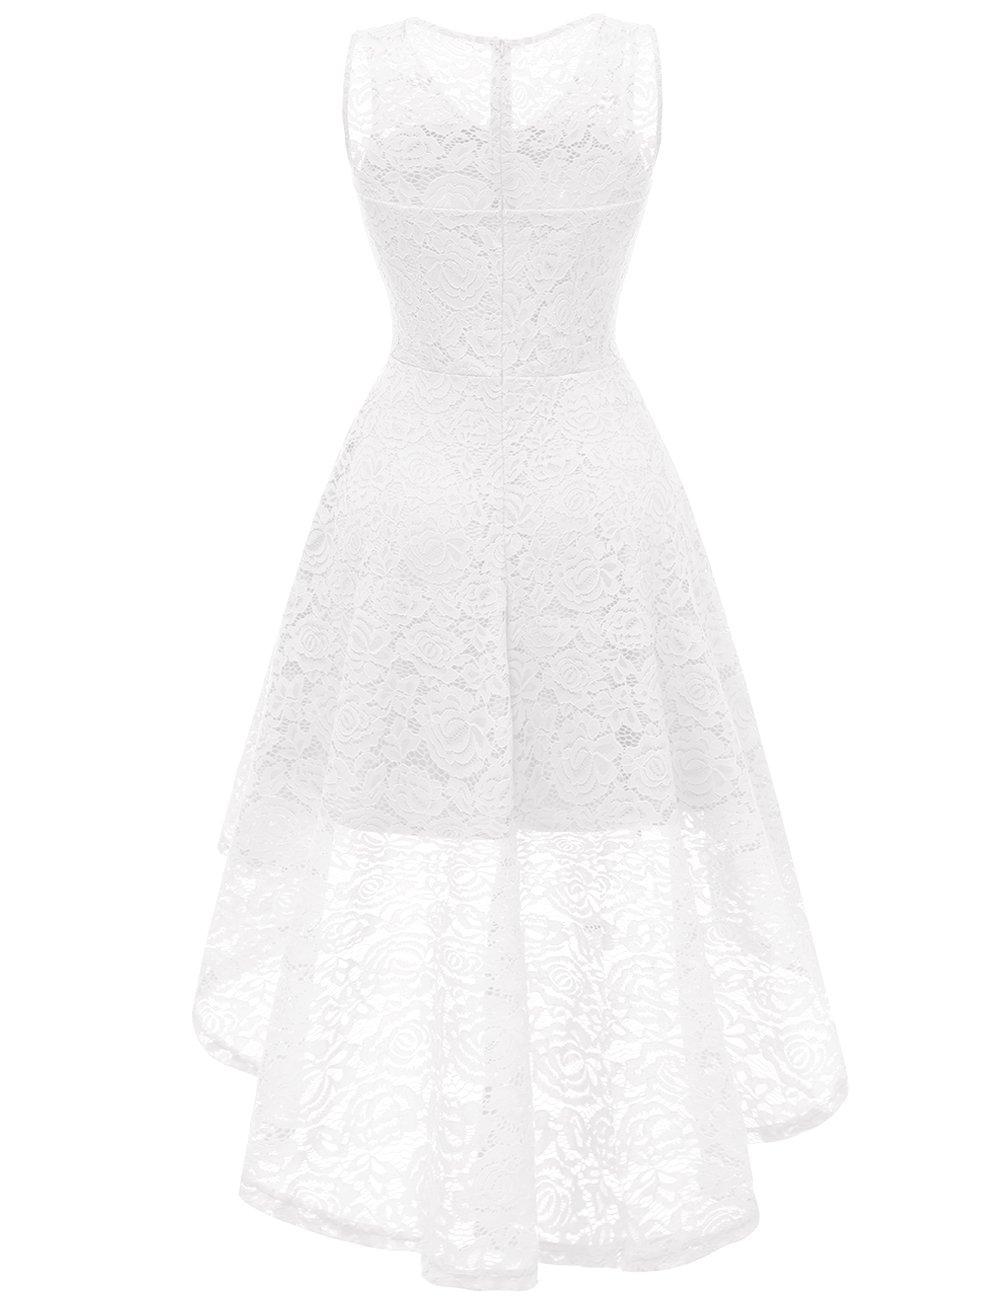 DRESSTELLS Women's Cocktail V-Neck Dress Floral Lace Hi-Lo Formal Swing Party Dress White XL by DRESSTELLS (Image #3)